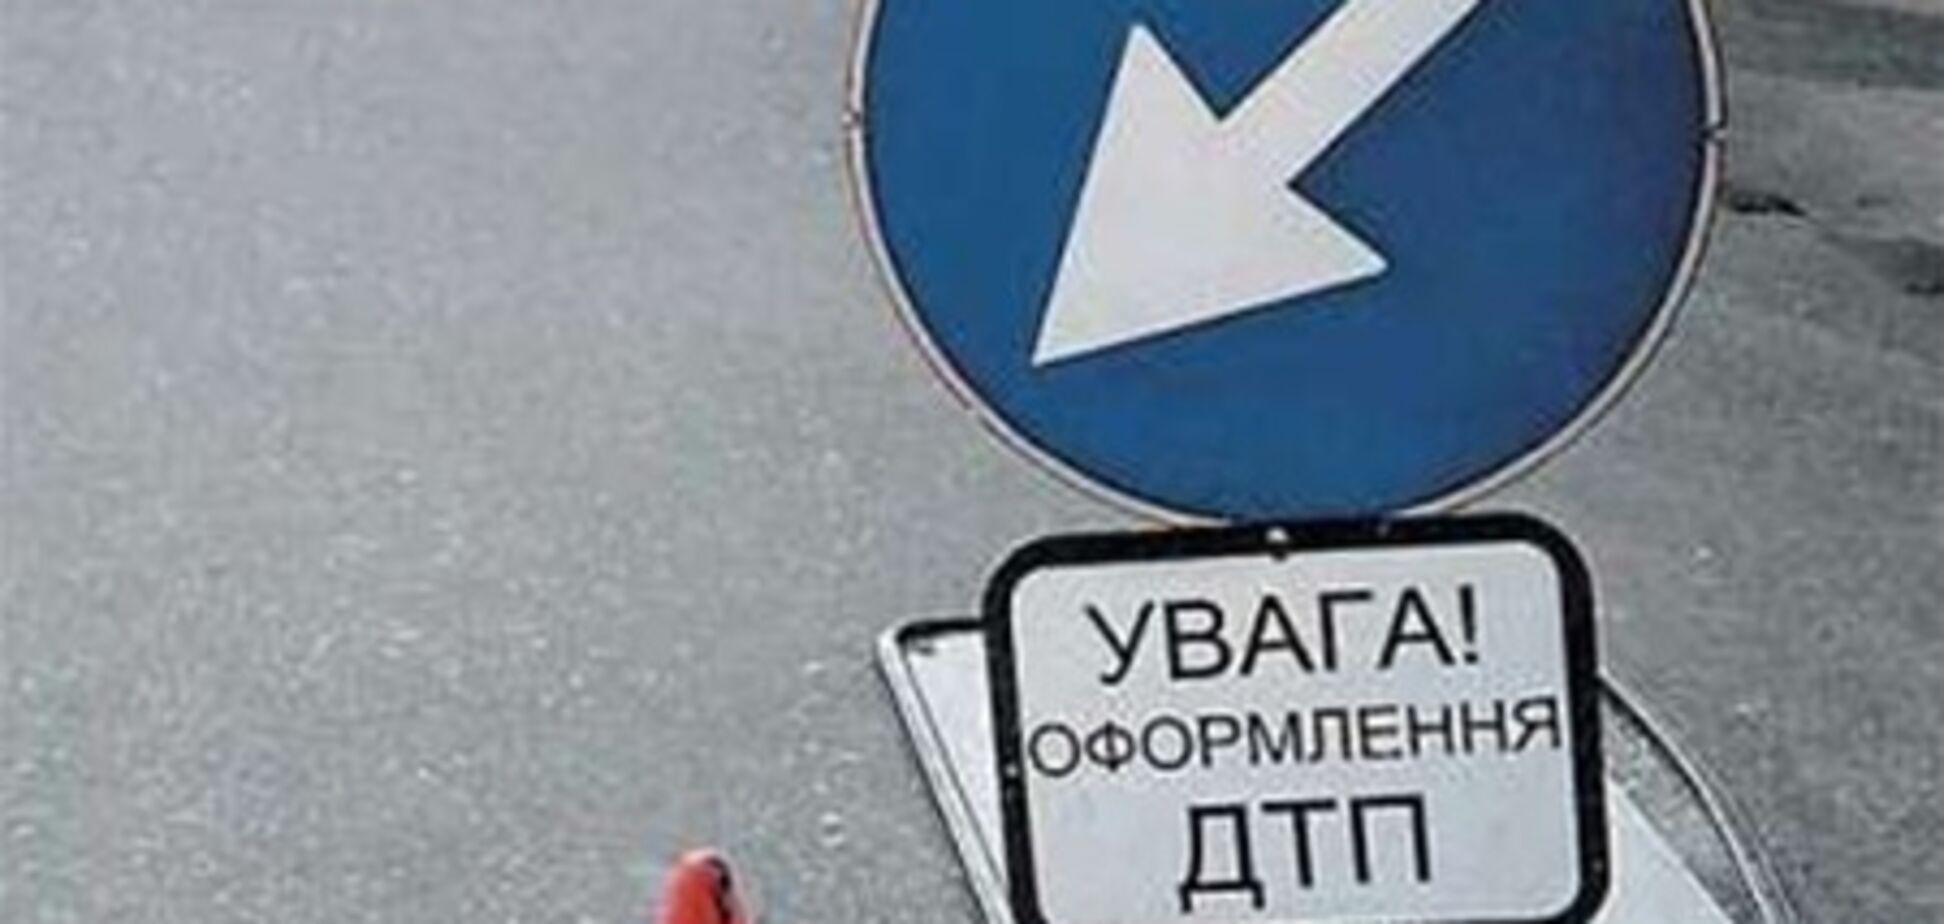 Трагическое ДТП: два пассажира погибли под колесами авто. ФОТО